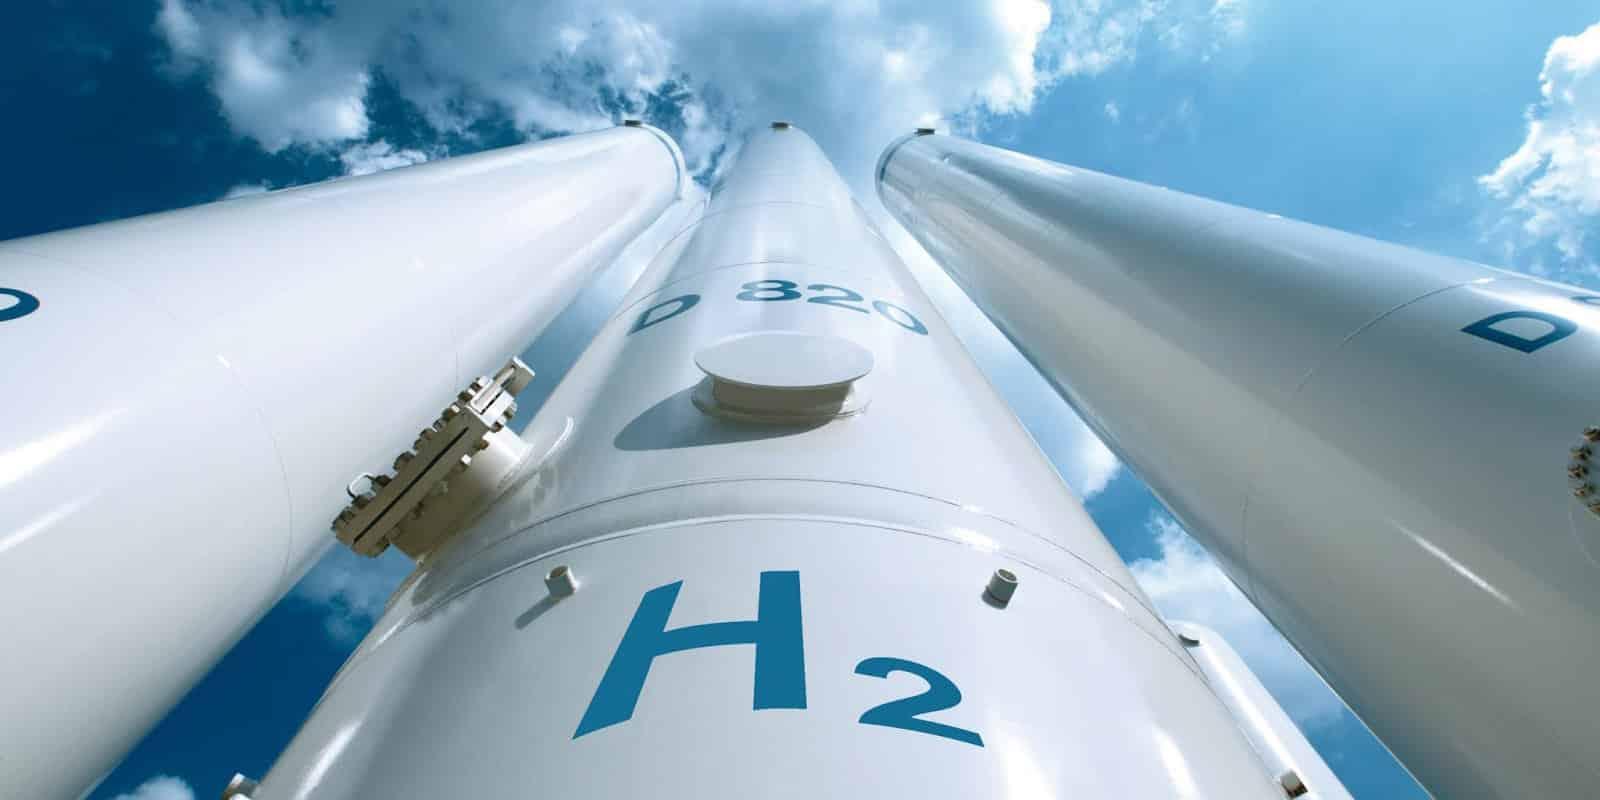 hidrogeno verde economia verde mitsubishi energia